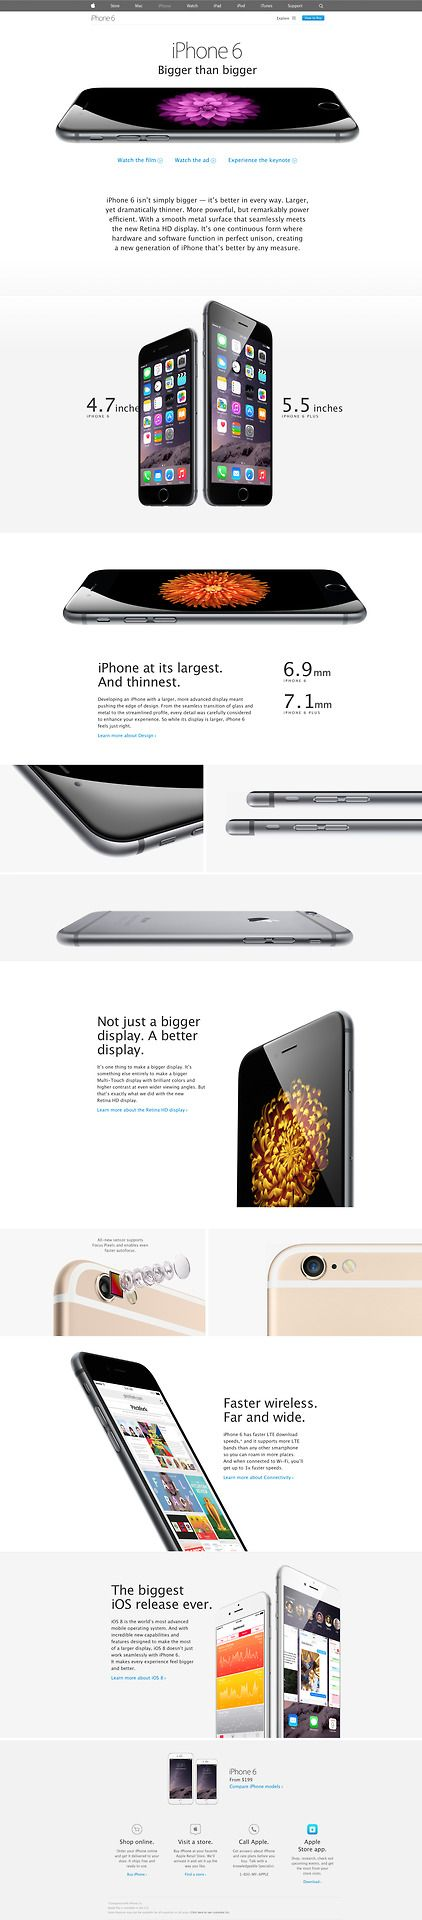 Unique Web Design, iPhone 6 #WebDesign #Design (http://www.pinterest.com/aldenchong/)